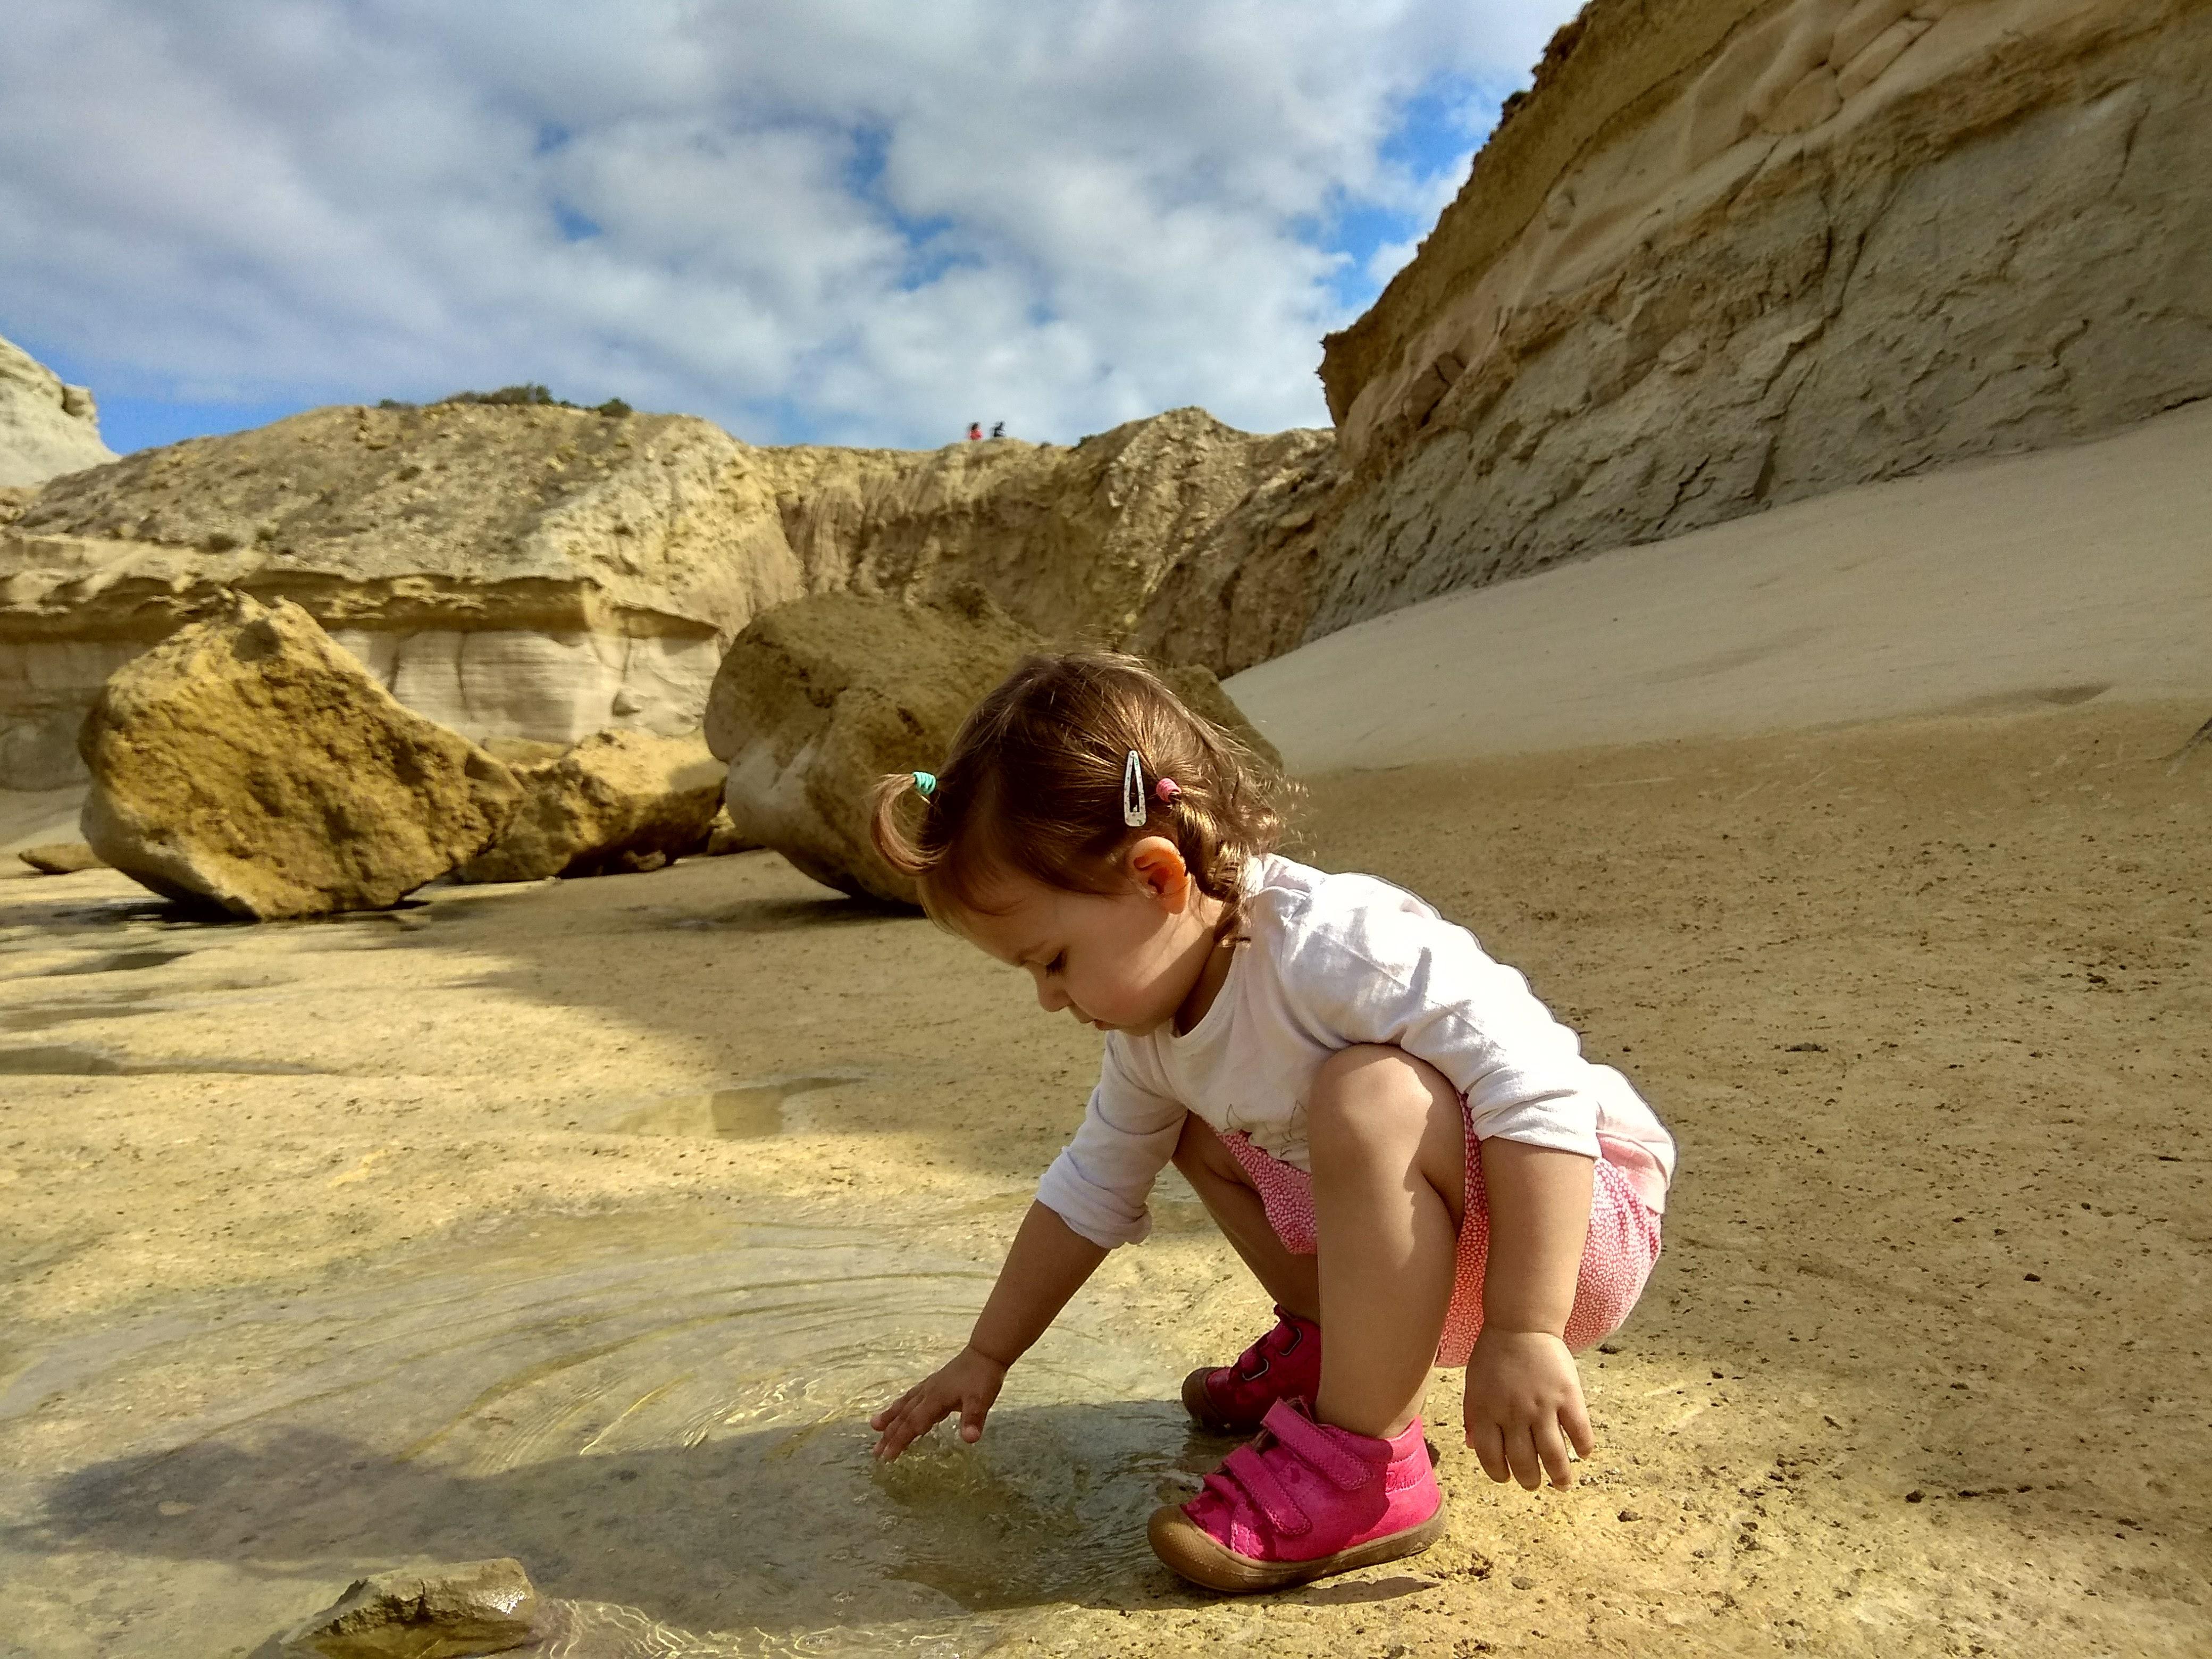 malta plaża z dzieckiem